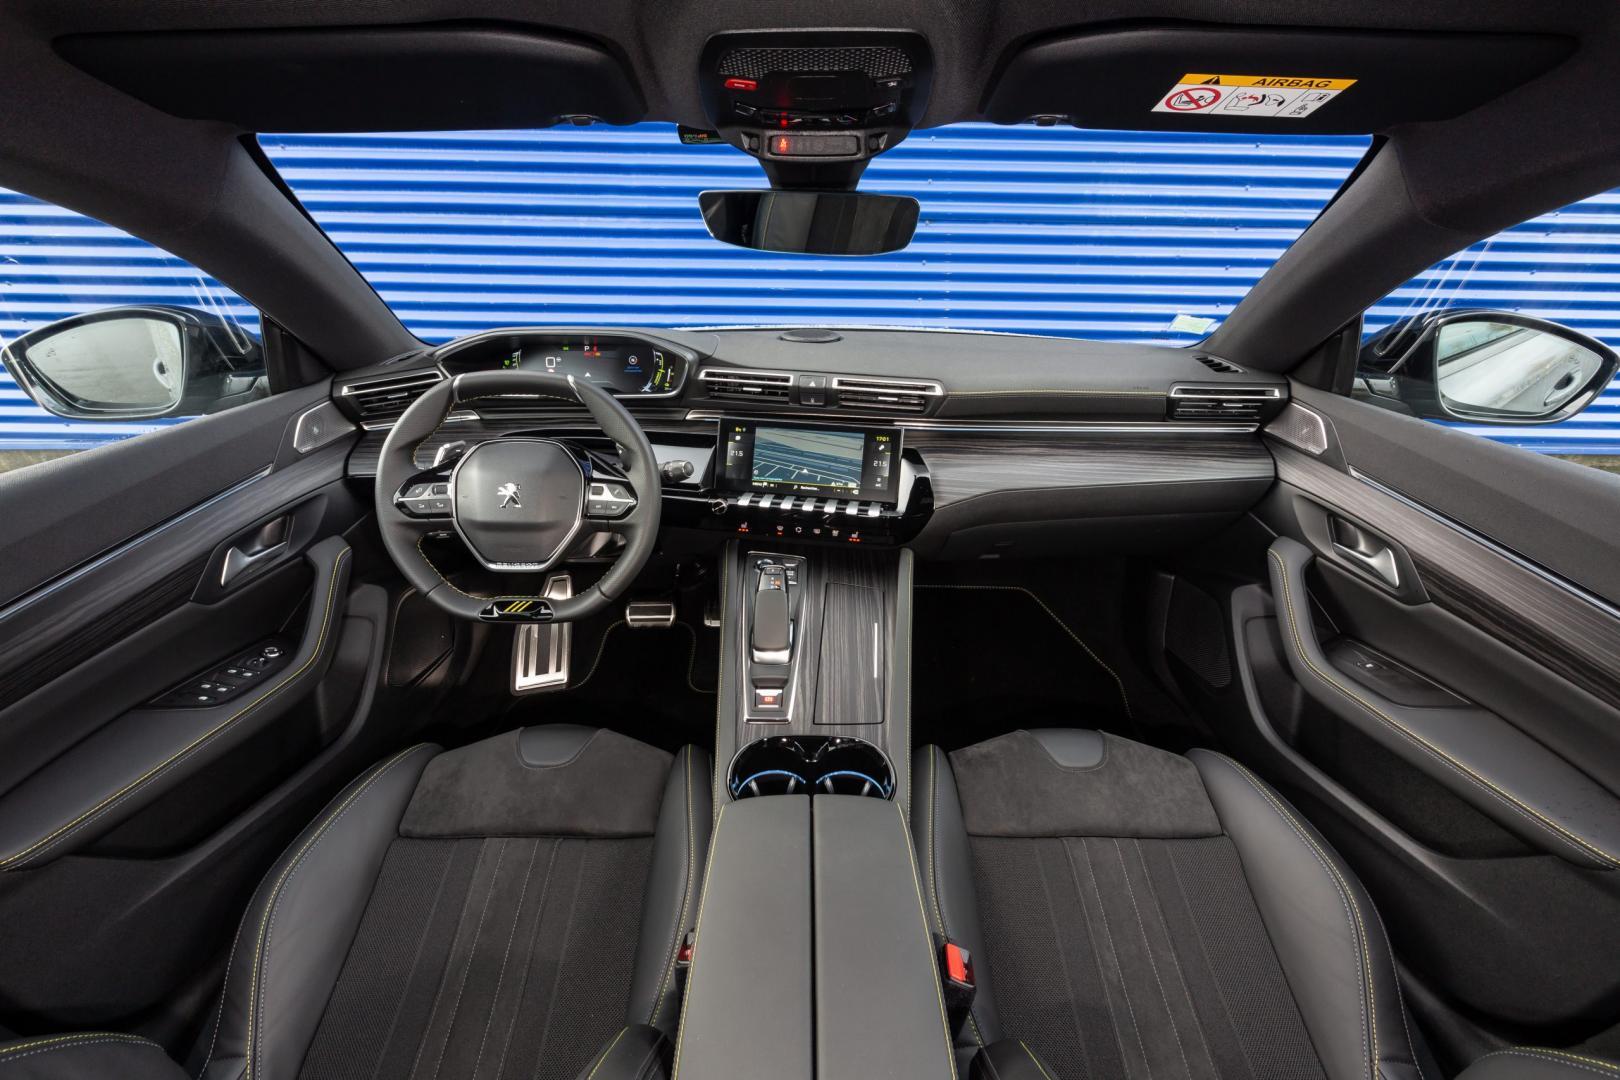 Peugeot 508 PSE HYbrid 360 interieur en dashboard